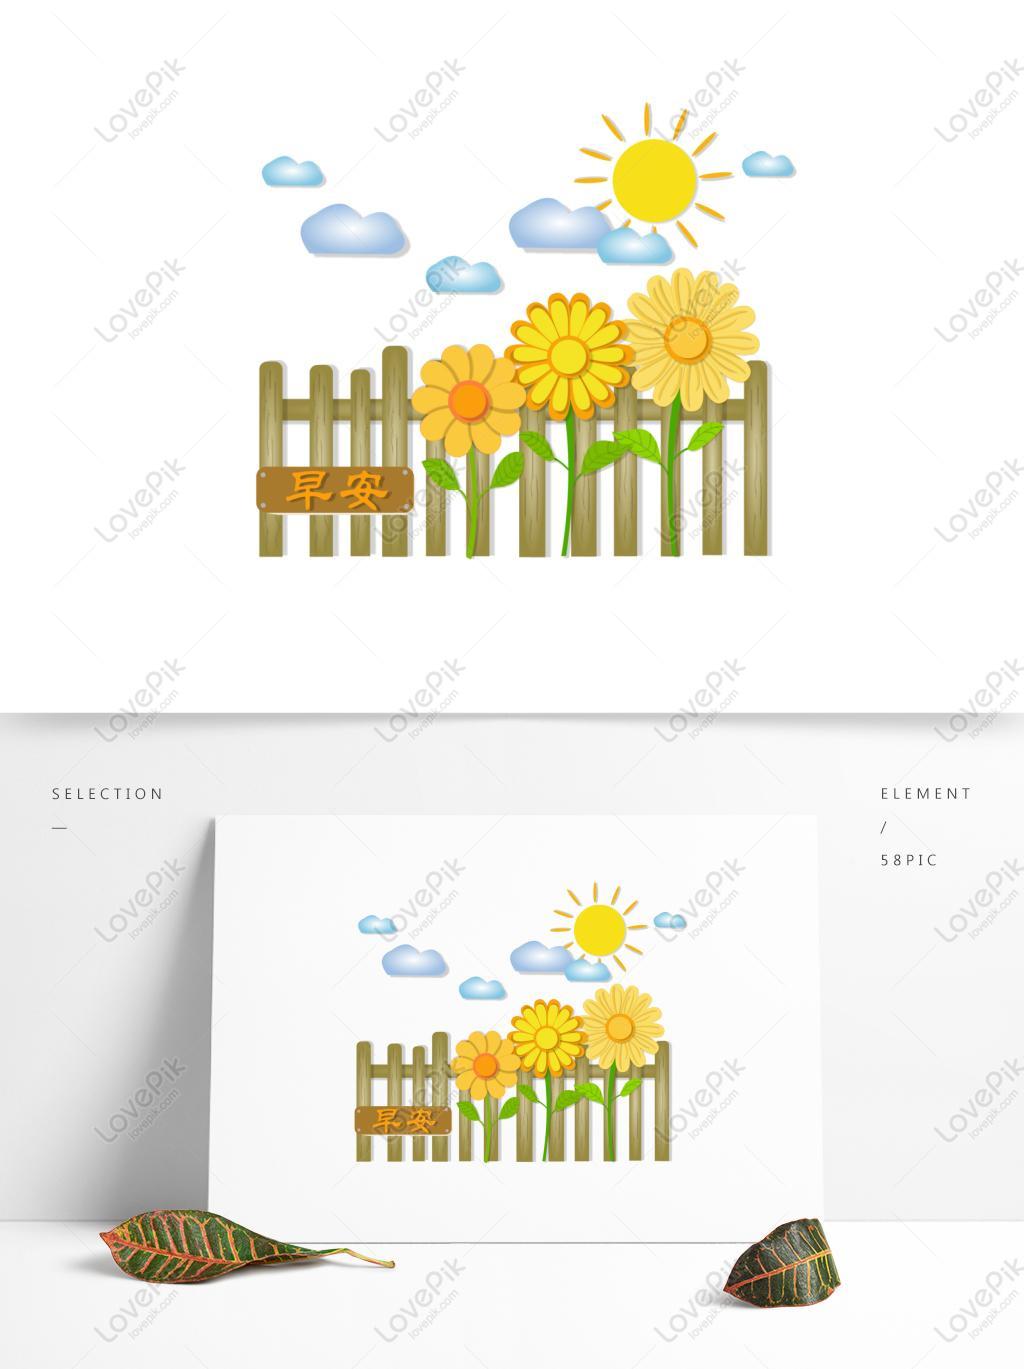 Sembuhkan Seri Pagi Hari Elemen Kartun Bunga Matahari Gambar